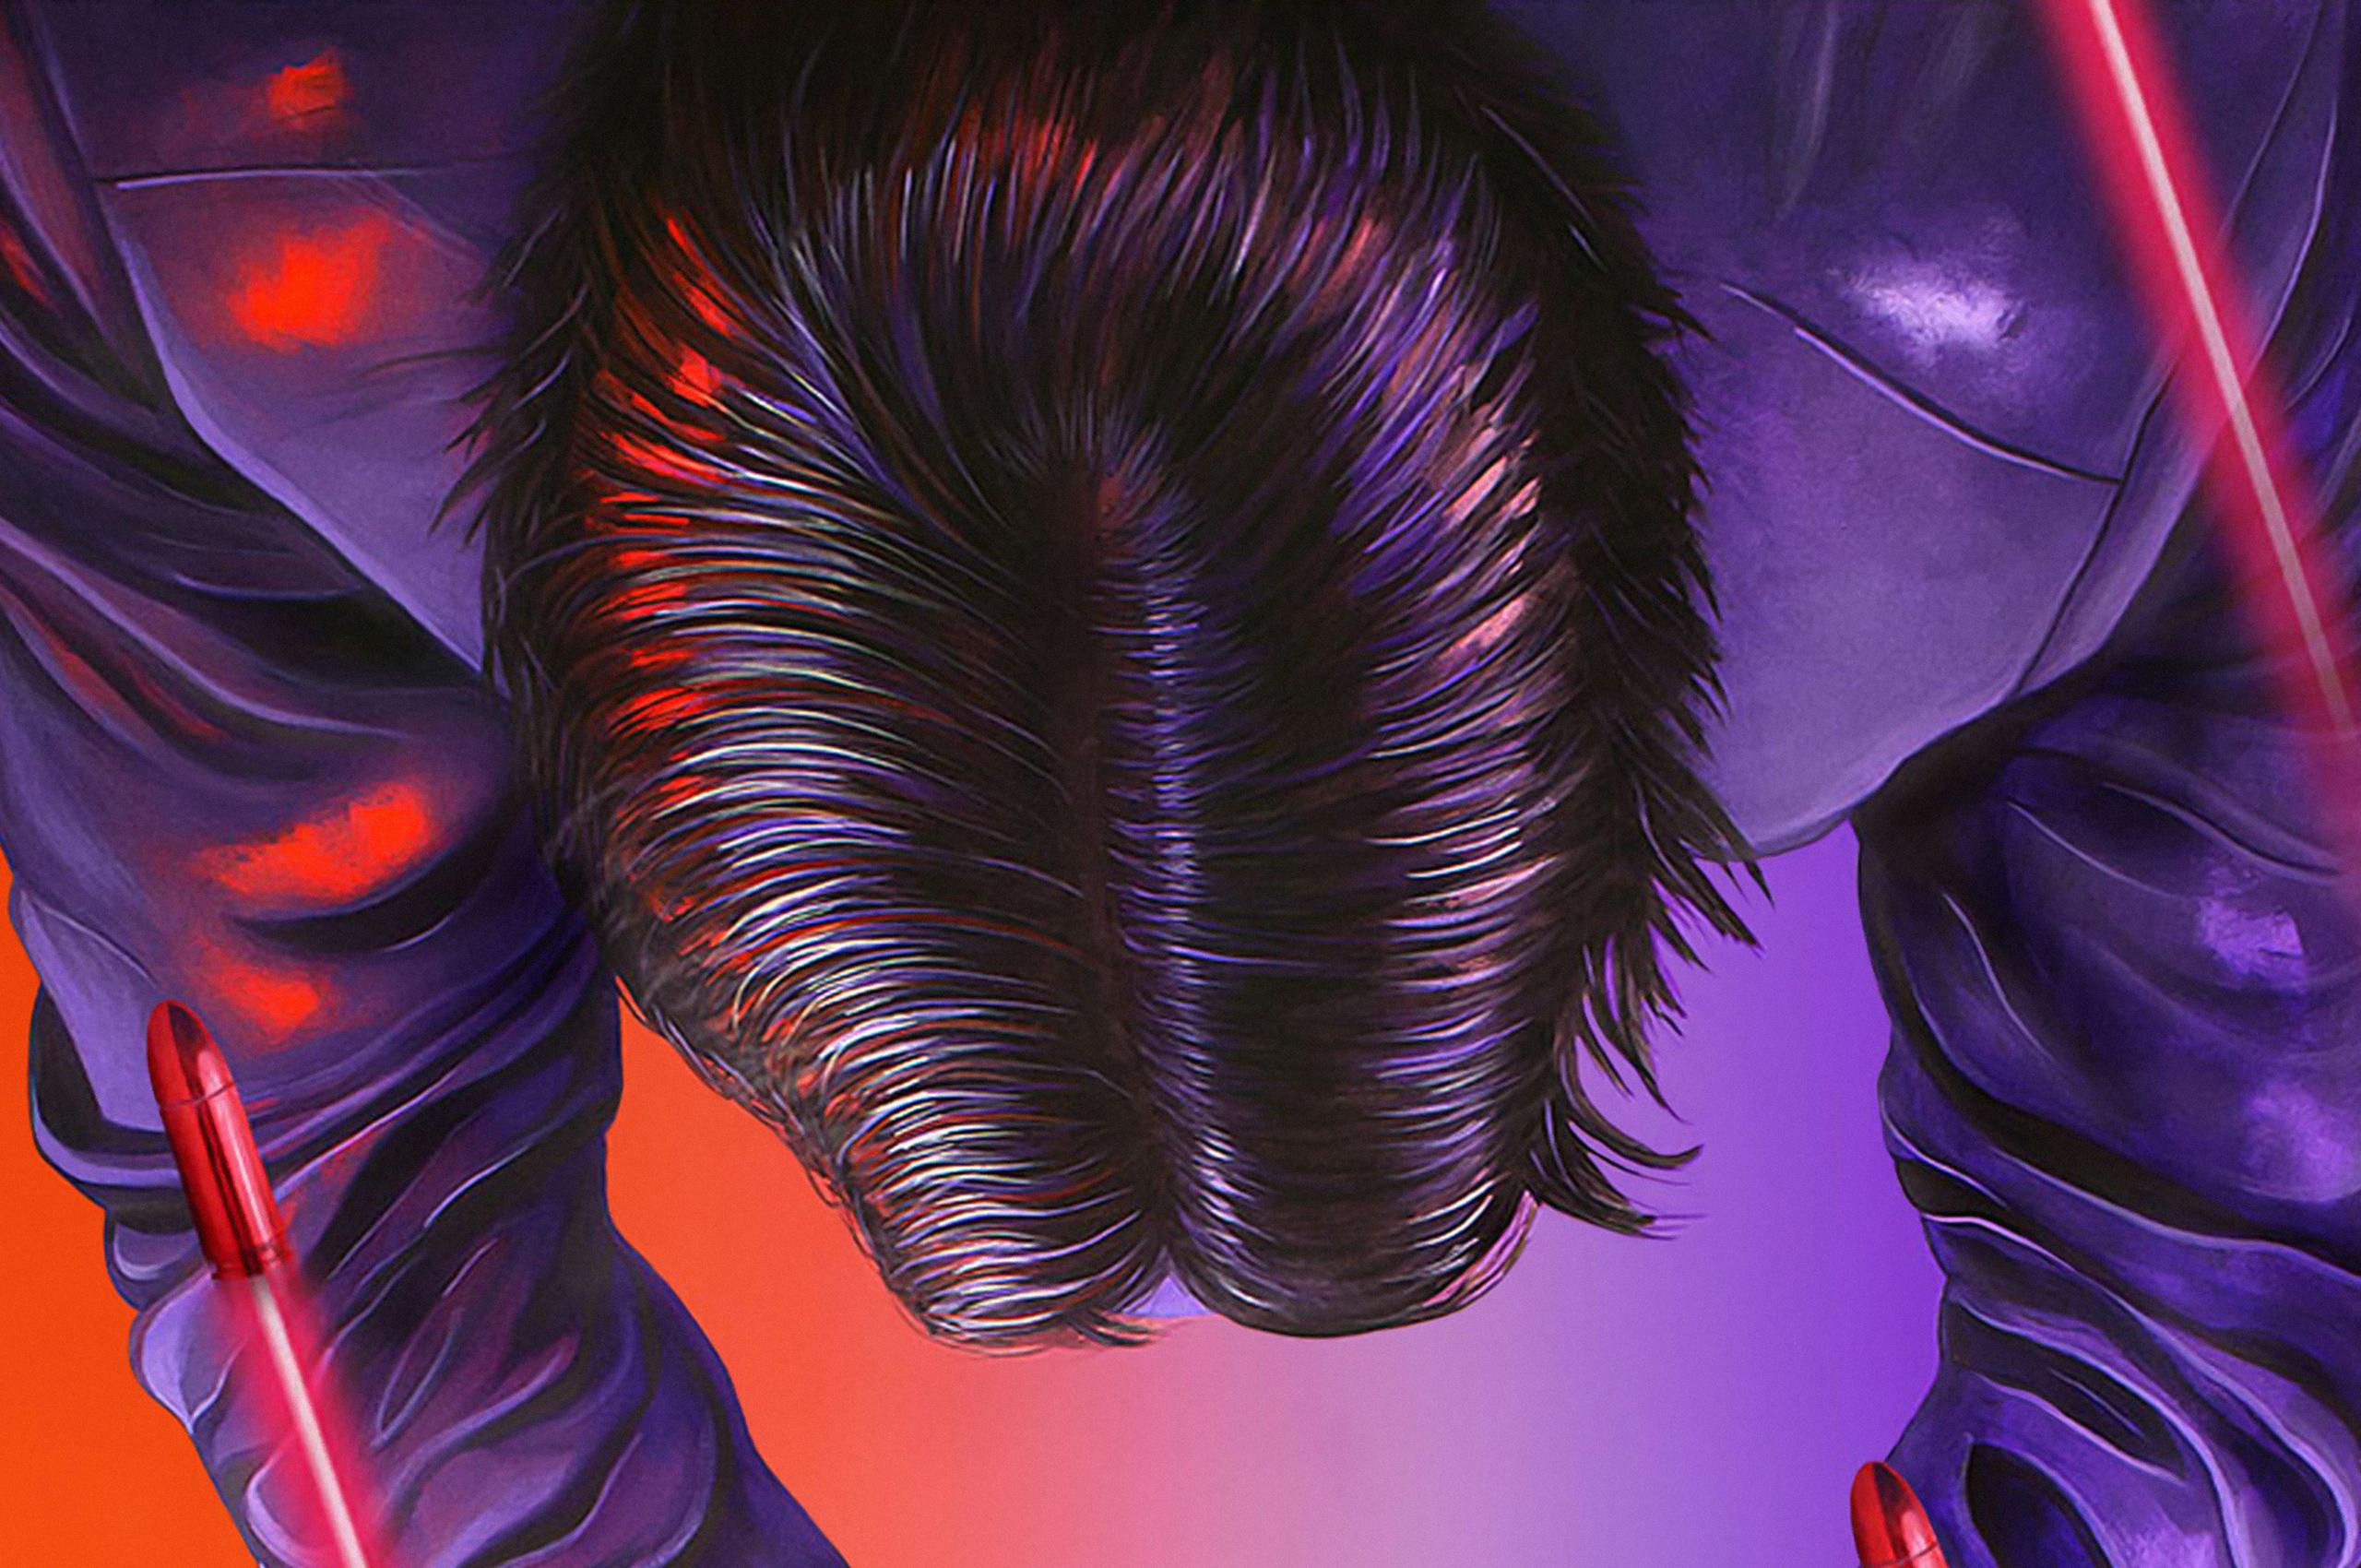 john-wick-chapter-3-parabellum-key-art-4k-ly.jpg